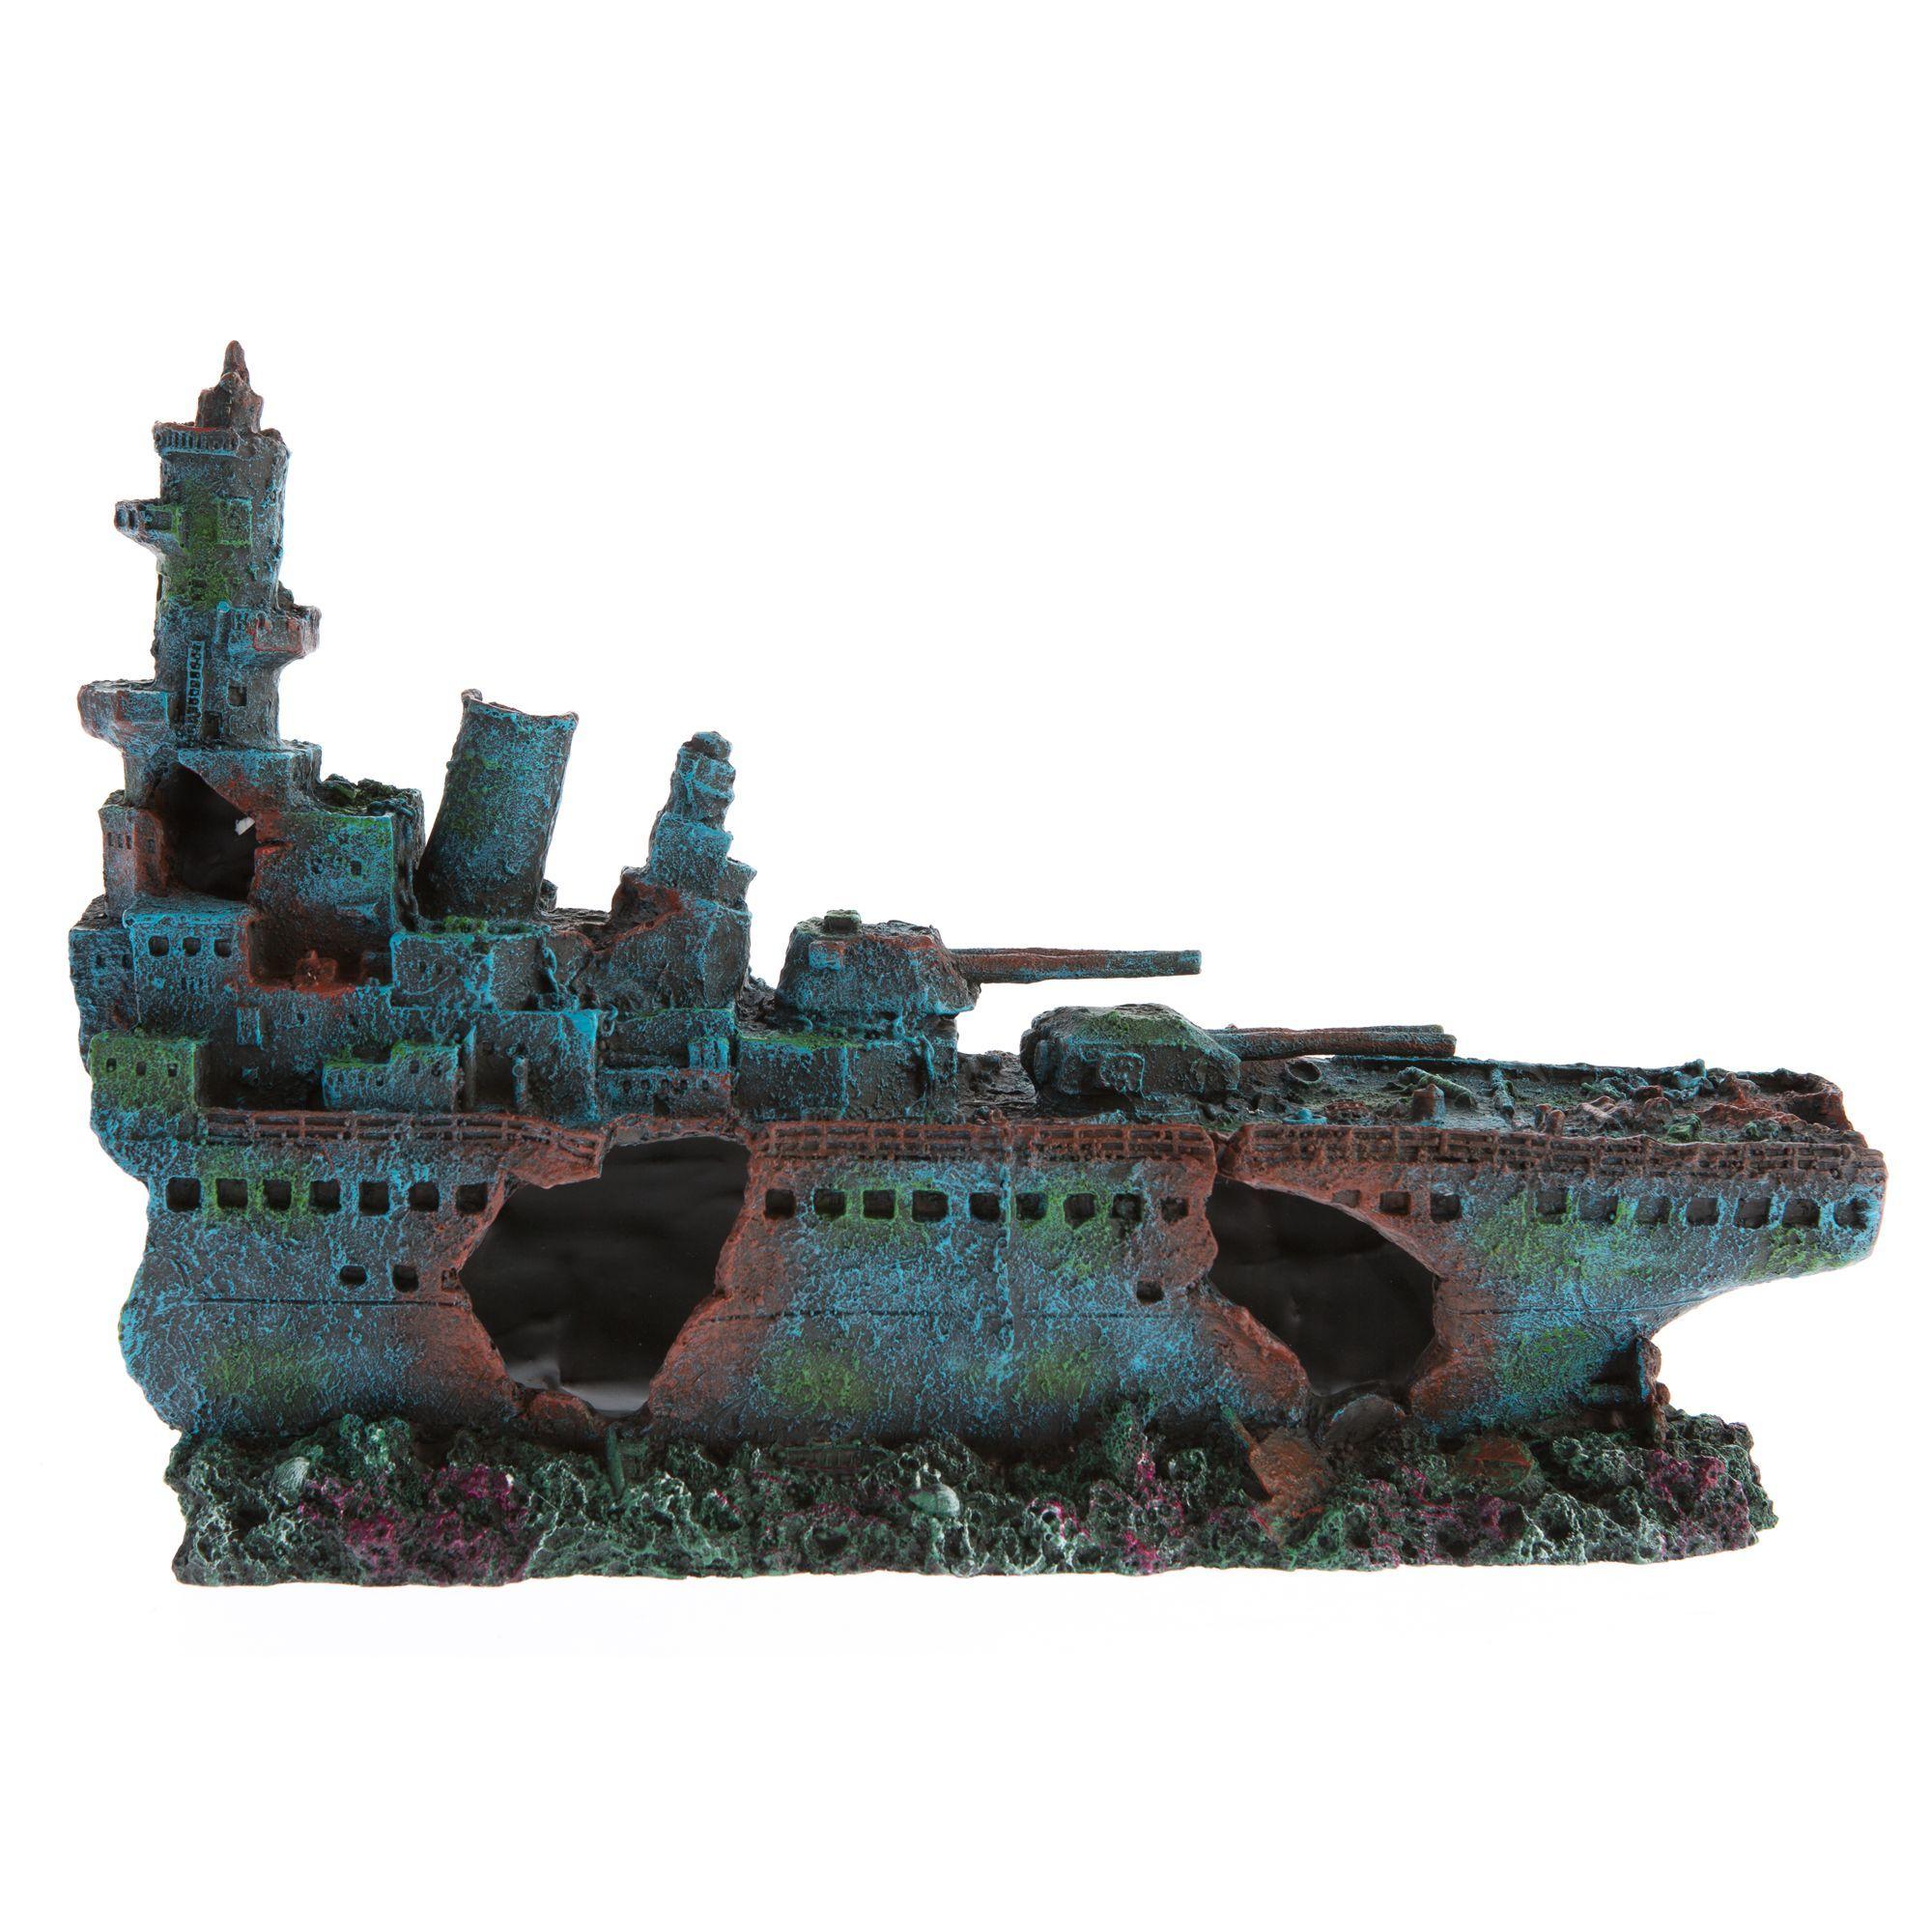 Top Fin Battleship Aquarium Ornament Fish Tank Accessories Aquarium Ornaments Aquarium Accessories